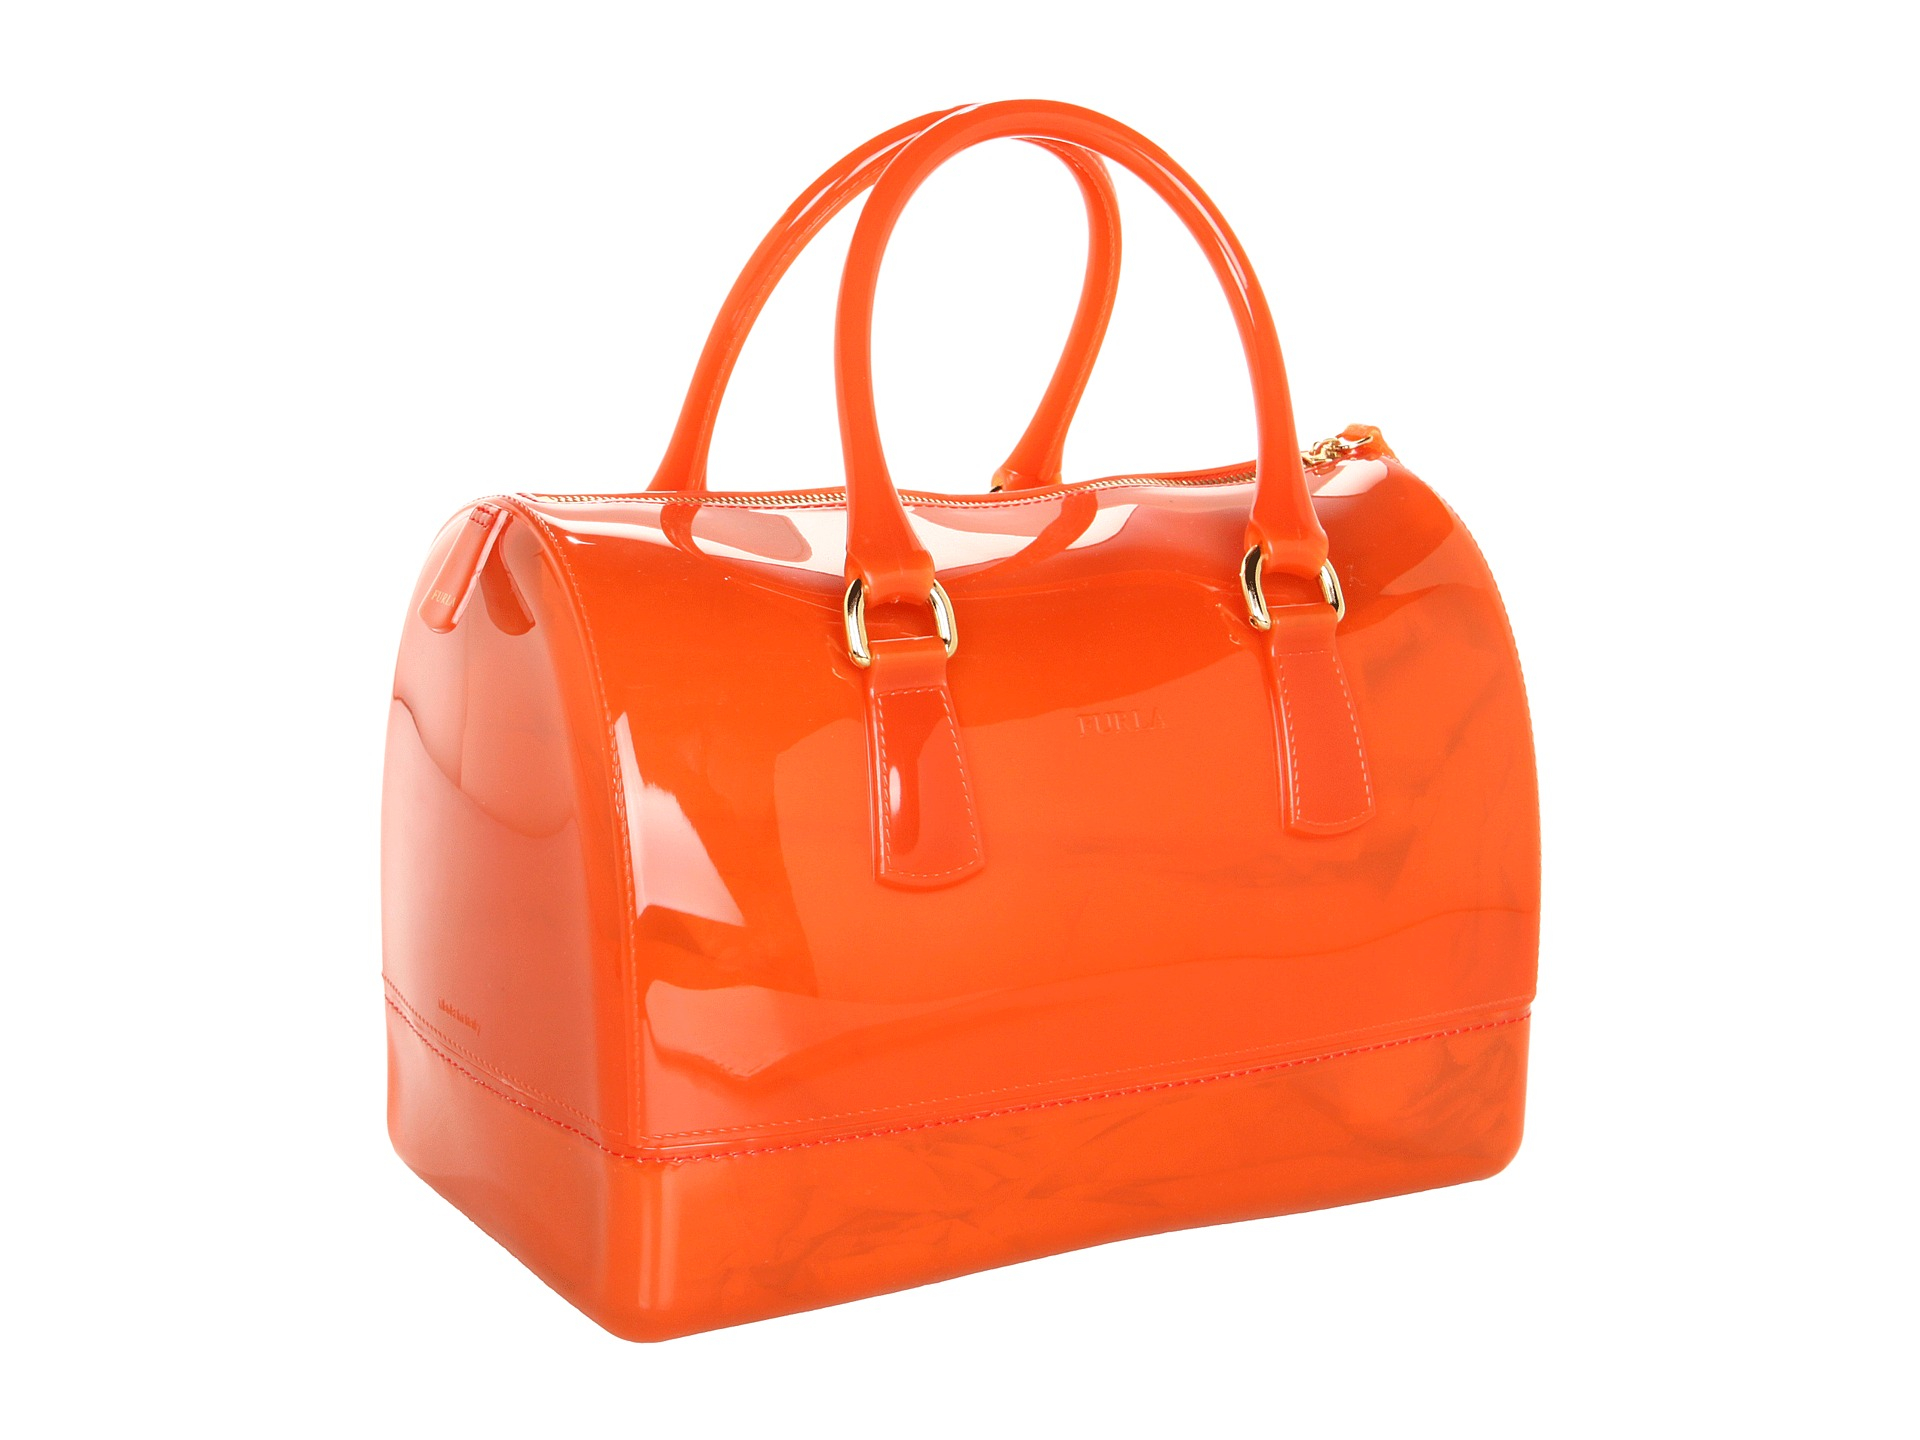 Candy furla bags